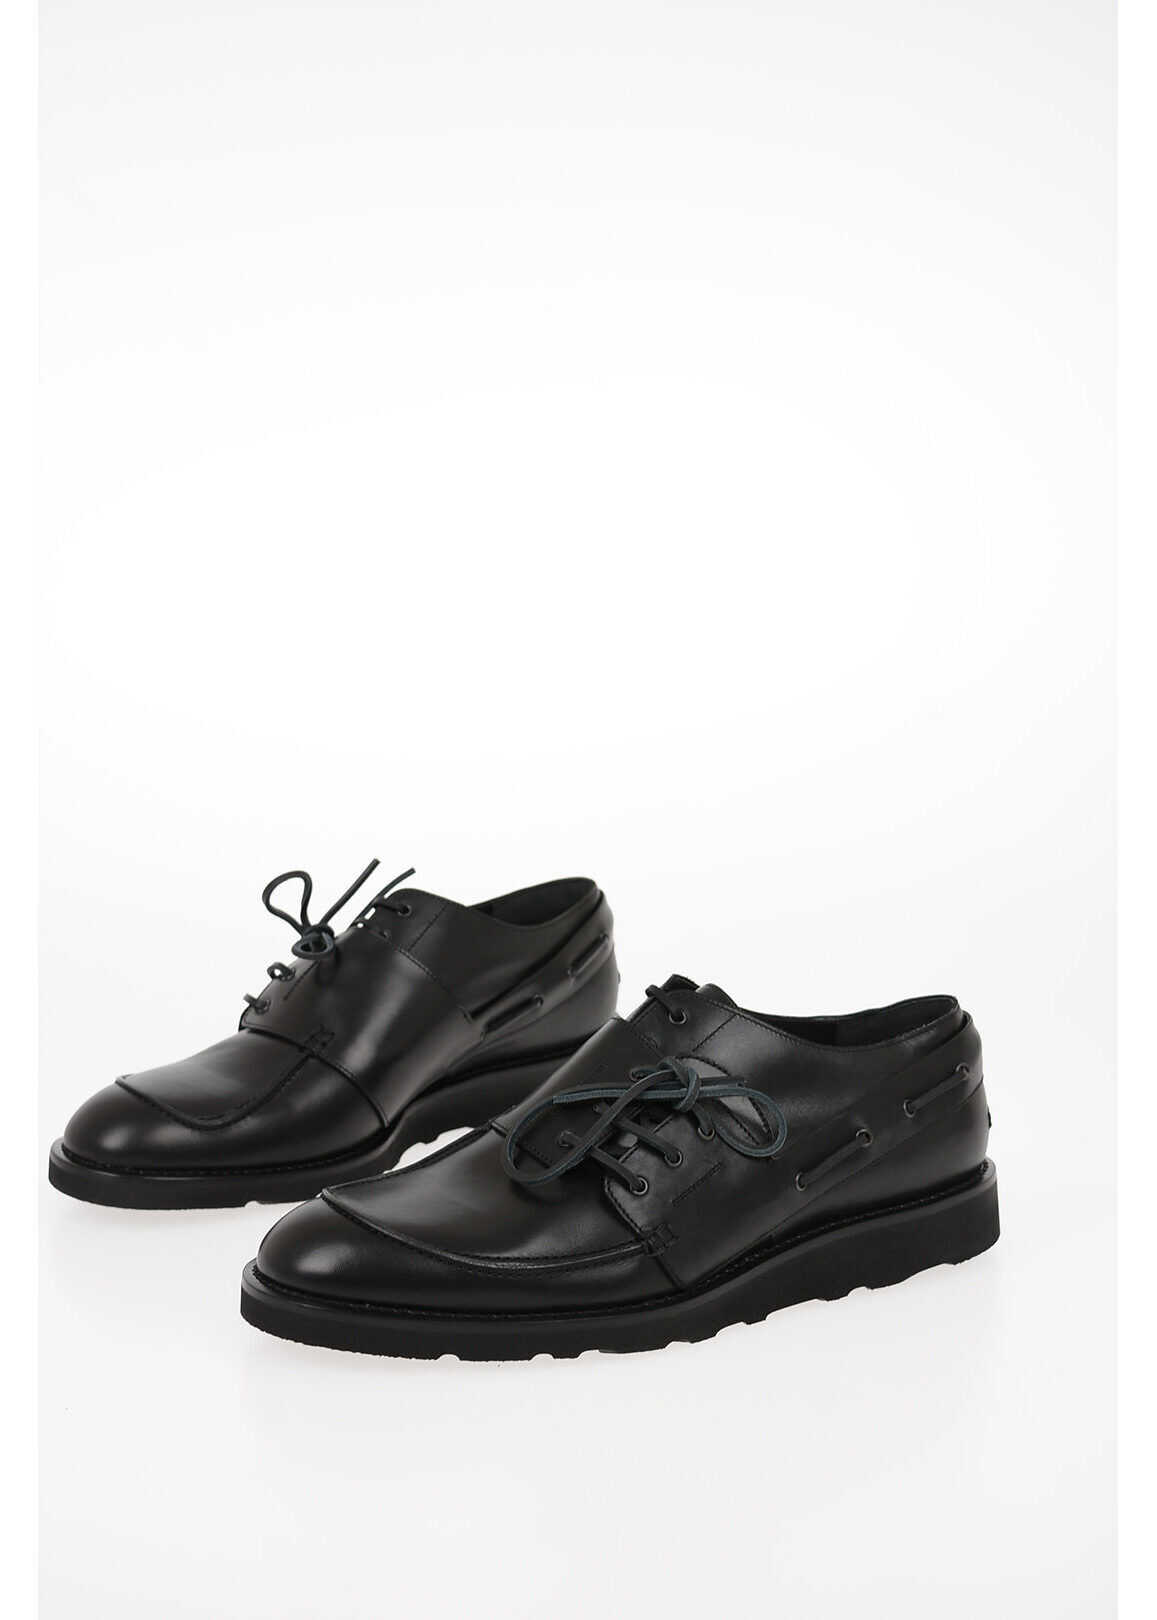 Maison Margiela MM22 Leather Double Laces Derby Shoes BLACK imagine b-mall.ro